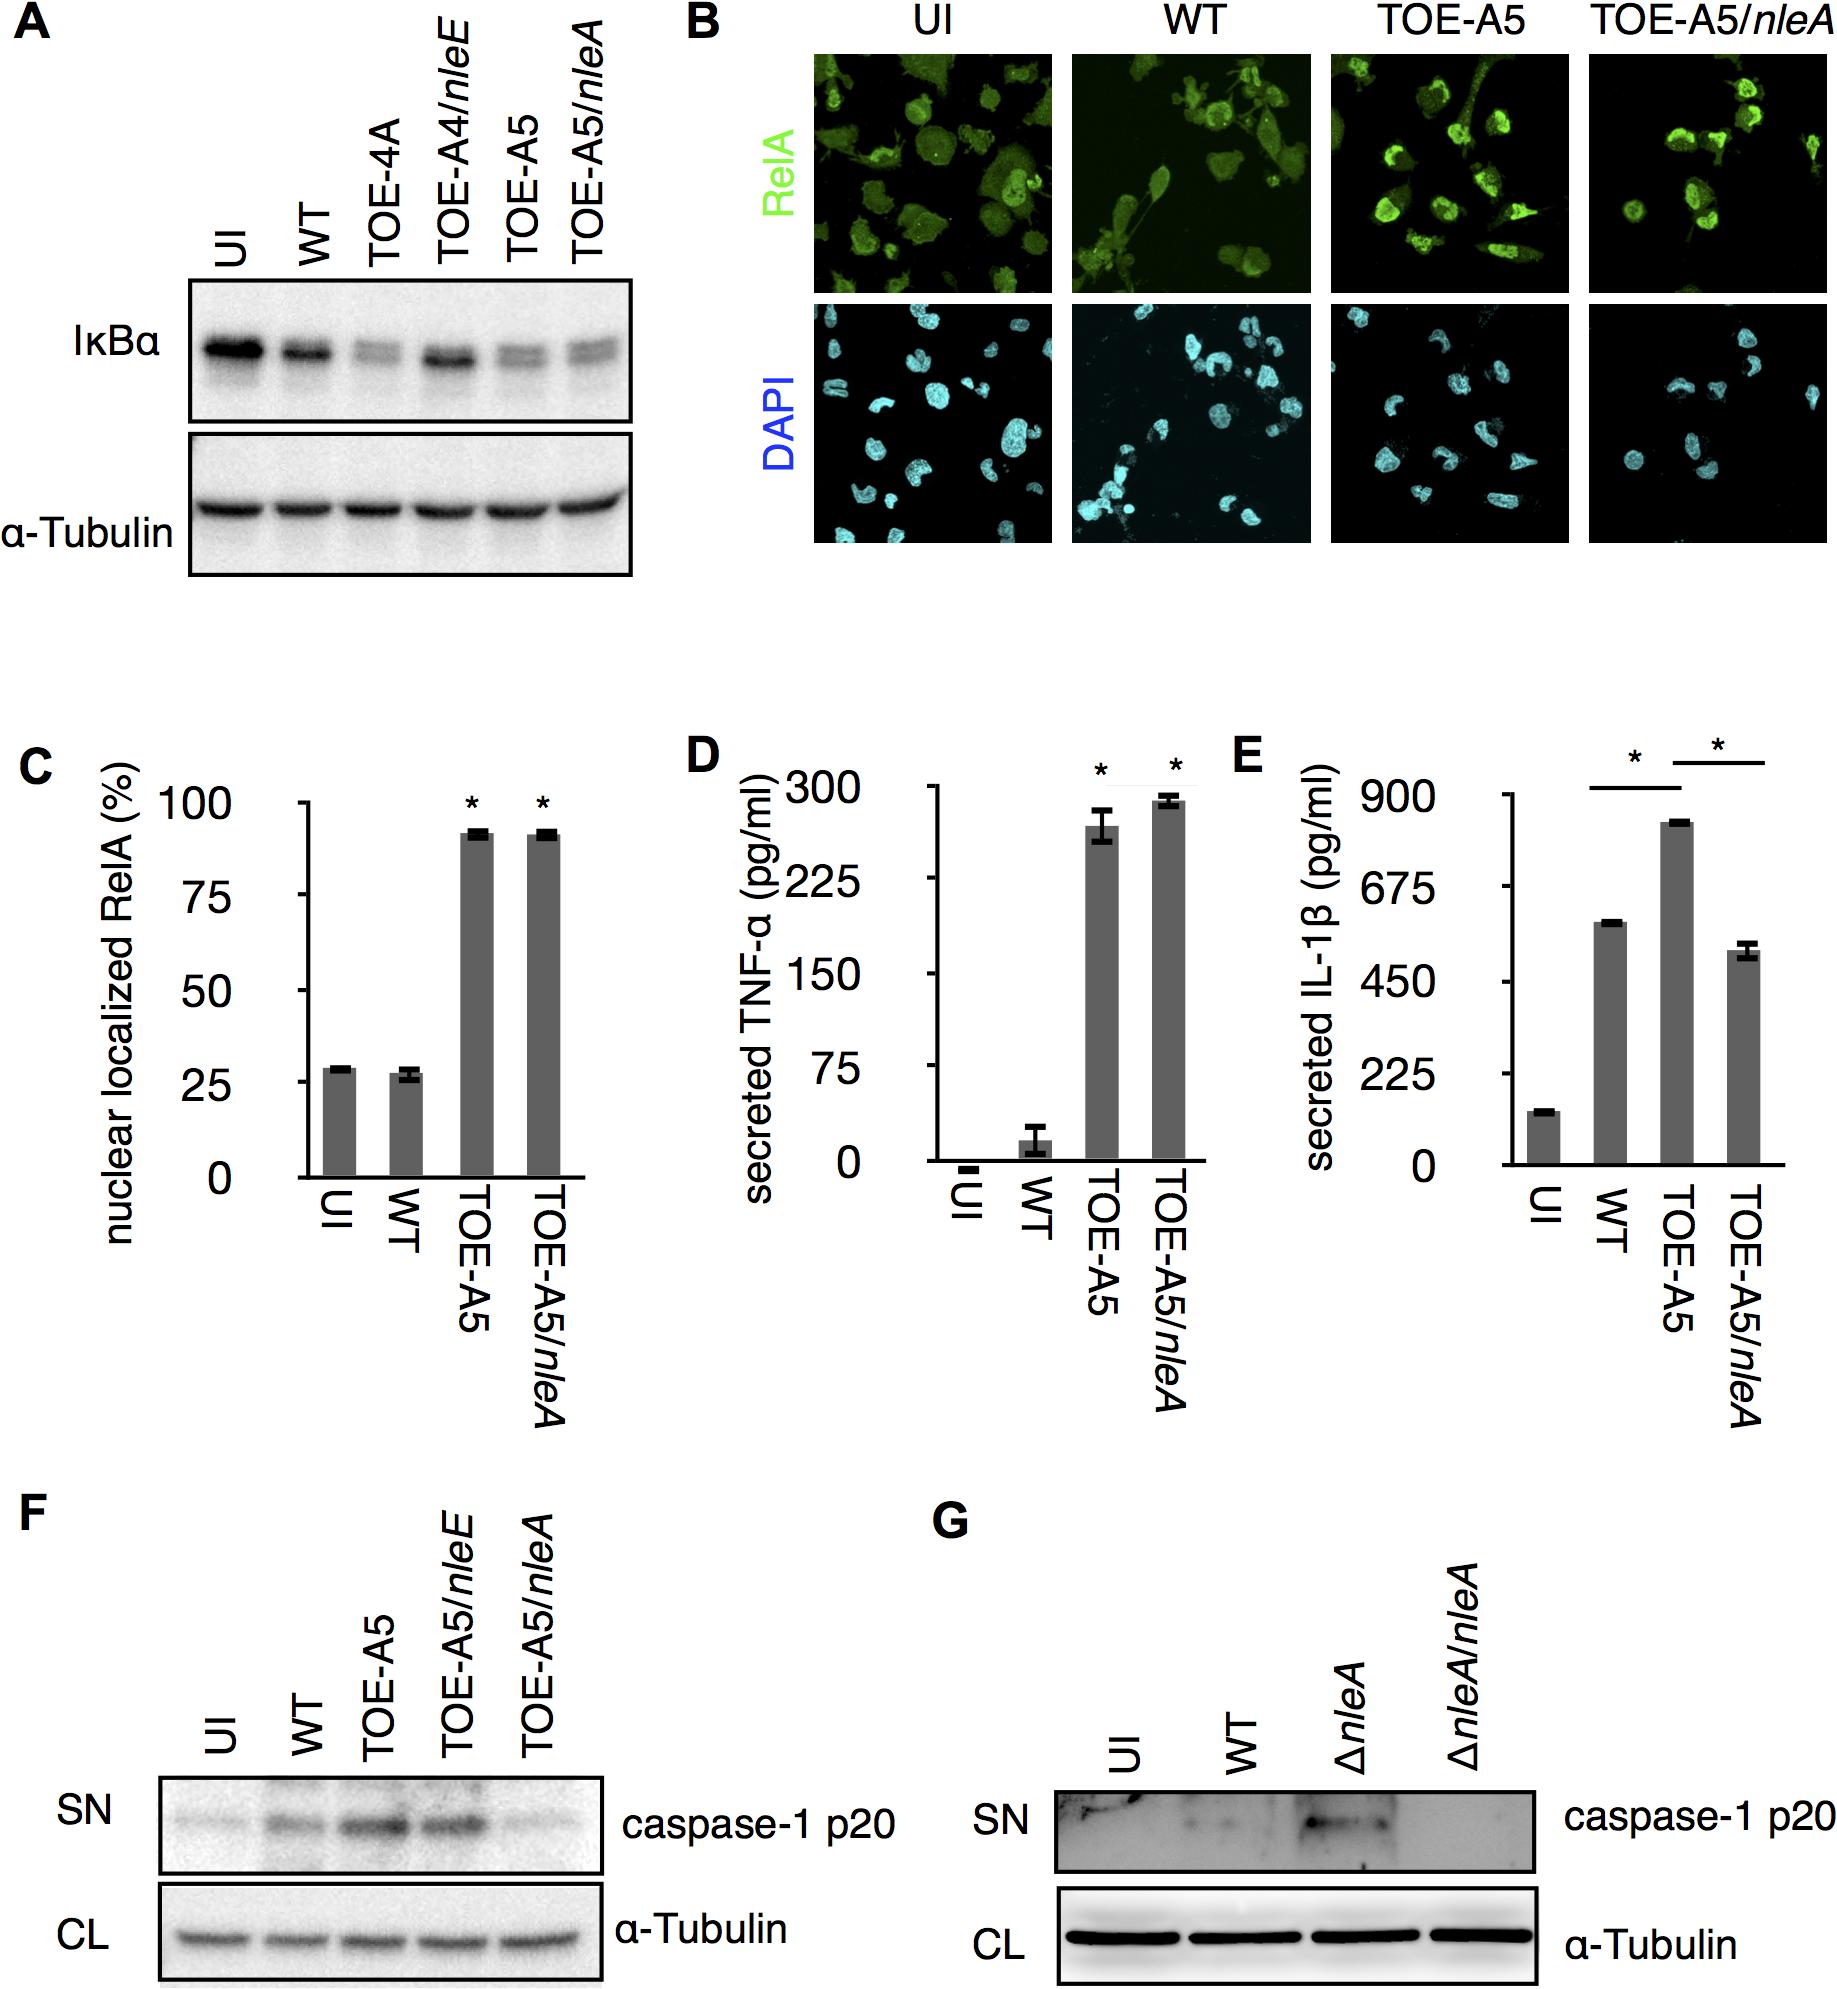 NleA suppresses caspase-1 activation.